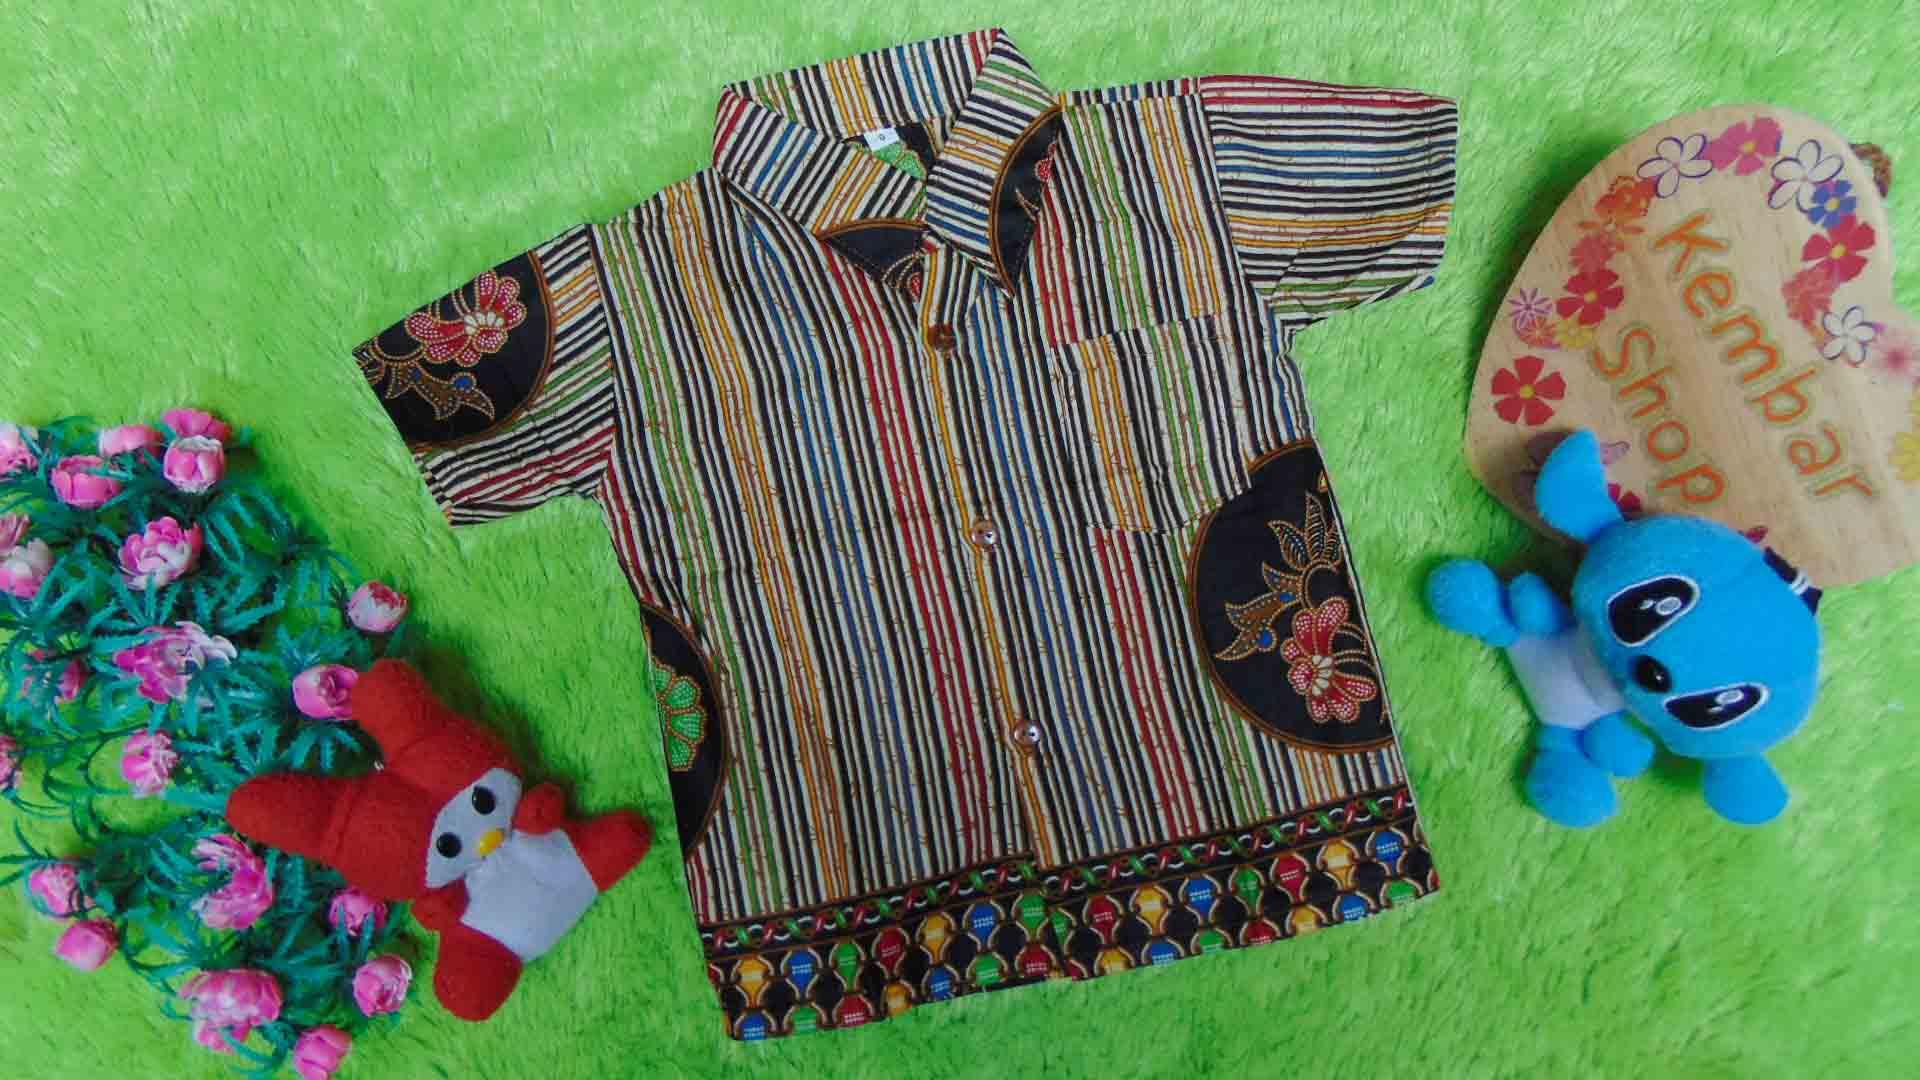 baju batik bayi anak laki-laki kemeja batik bayi hem anak cowok uk 0-2th baju pesta motif Rainbow Lurik Bunga Tengah 3